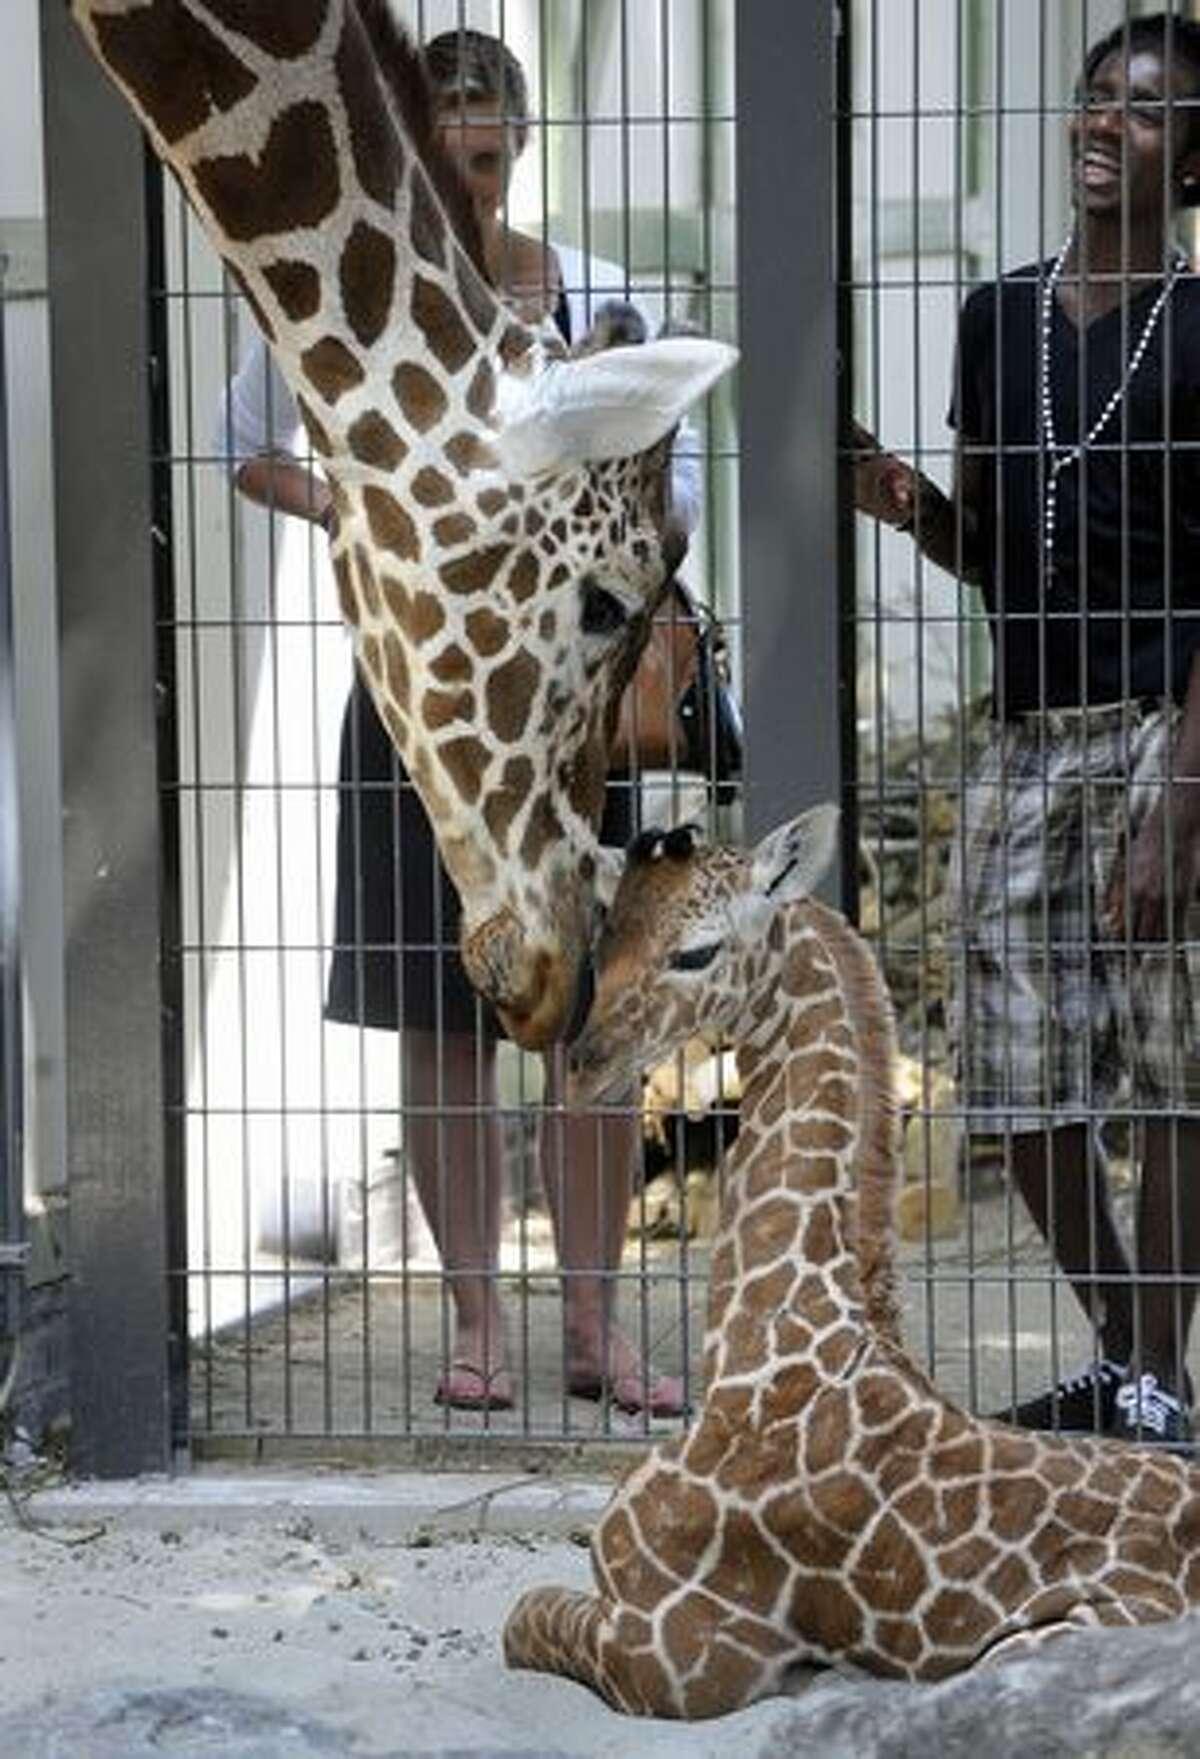 Giraffe mother Iwana takes care of her newborn baby in Artis zoo in Amsterdam, on June 28, 2010.